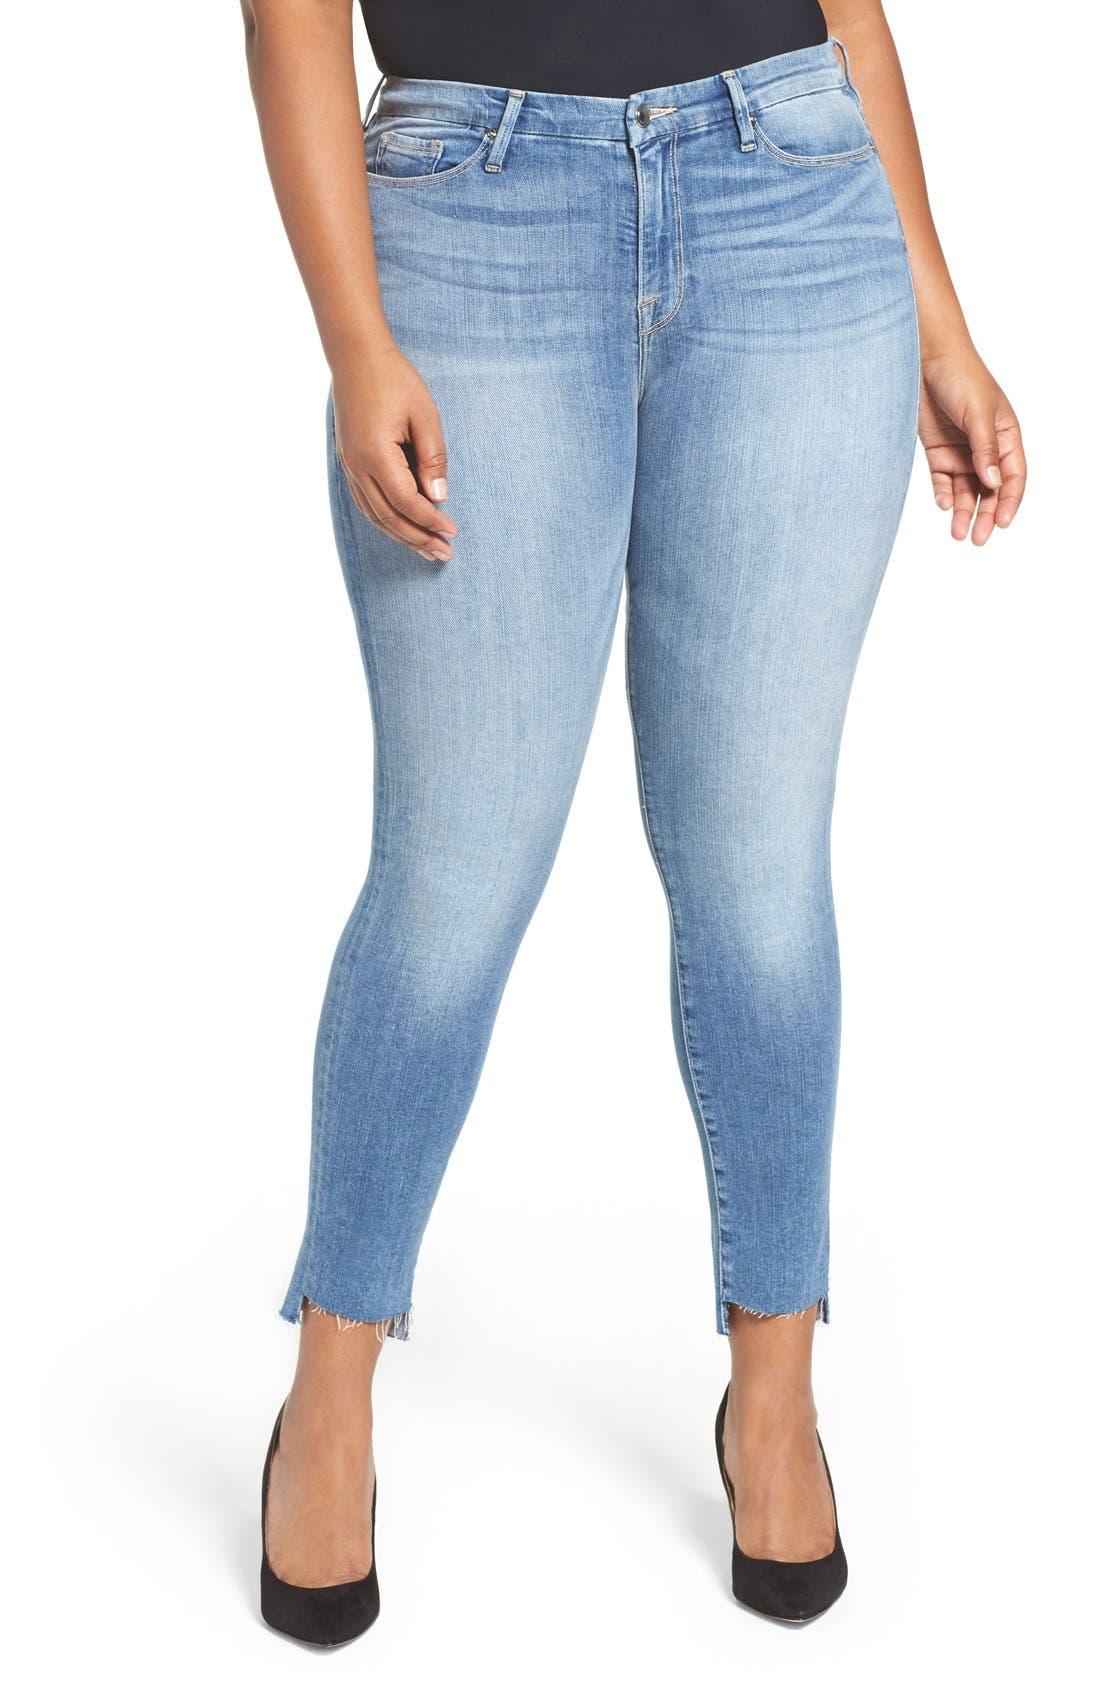 Main Image - Good American Good Legs High Rise Raw Step Hem Skinny Jeans